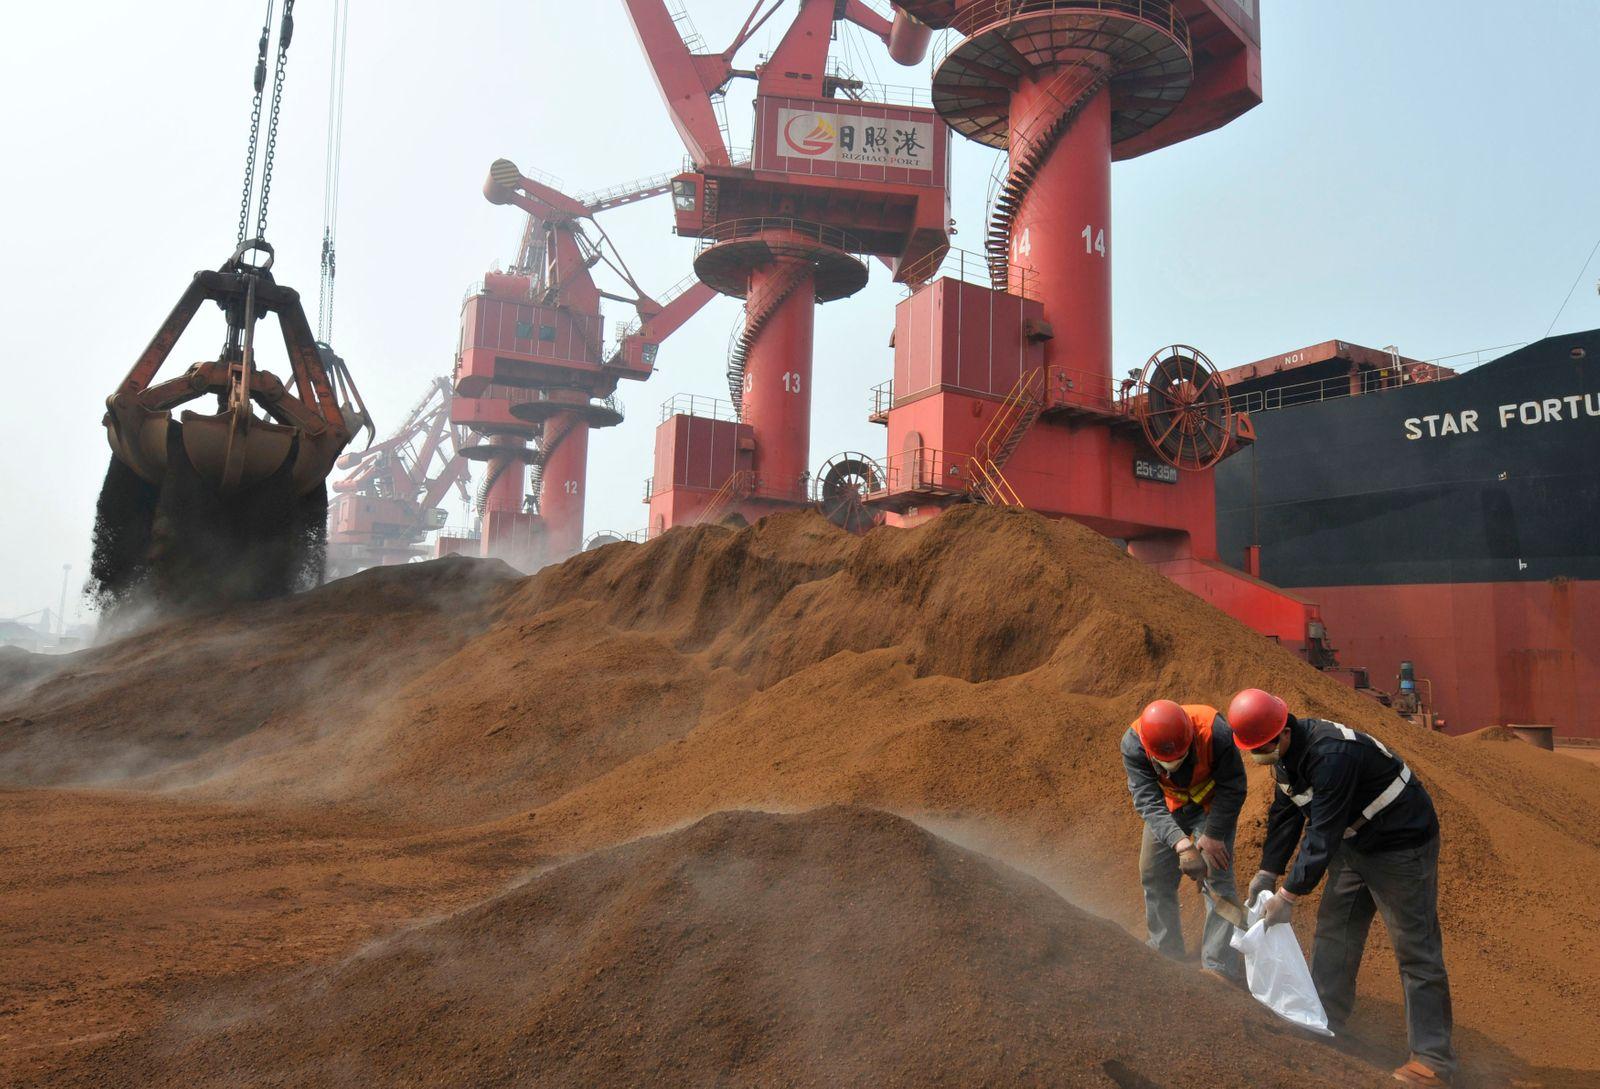 Bergbau; Eisenerz / Rhizhao Port, China